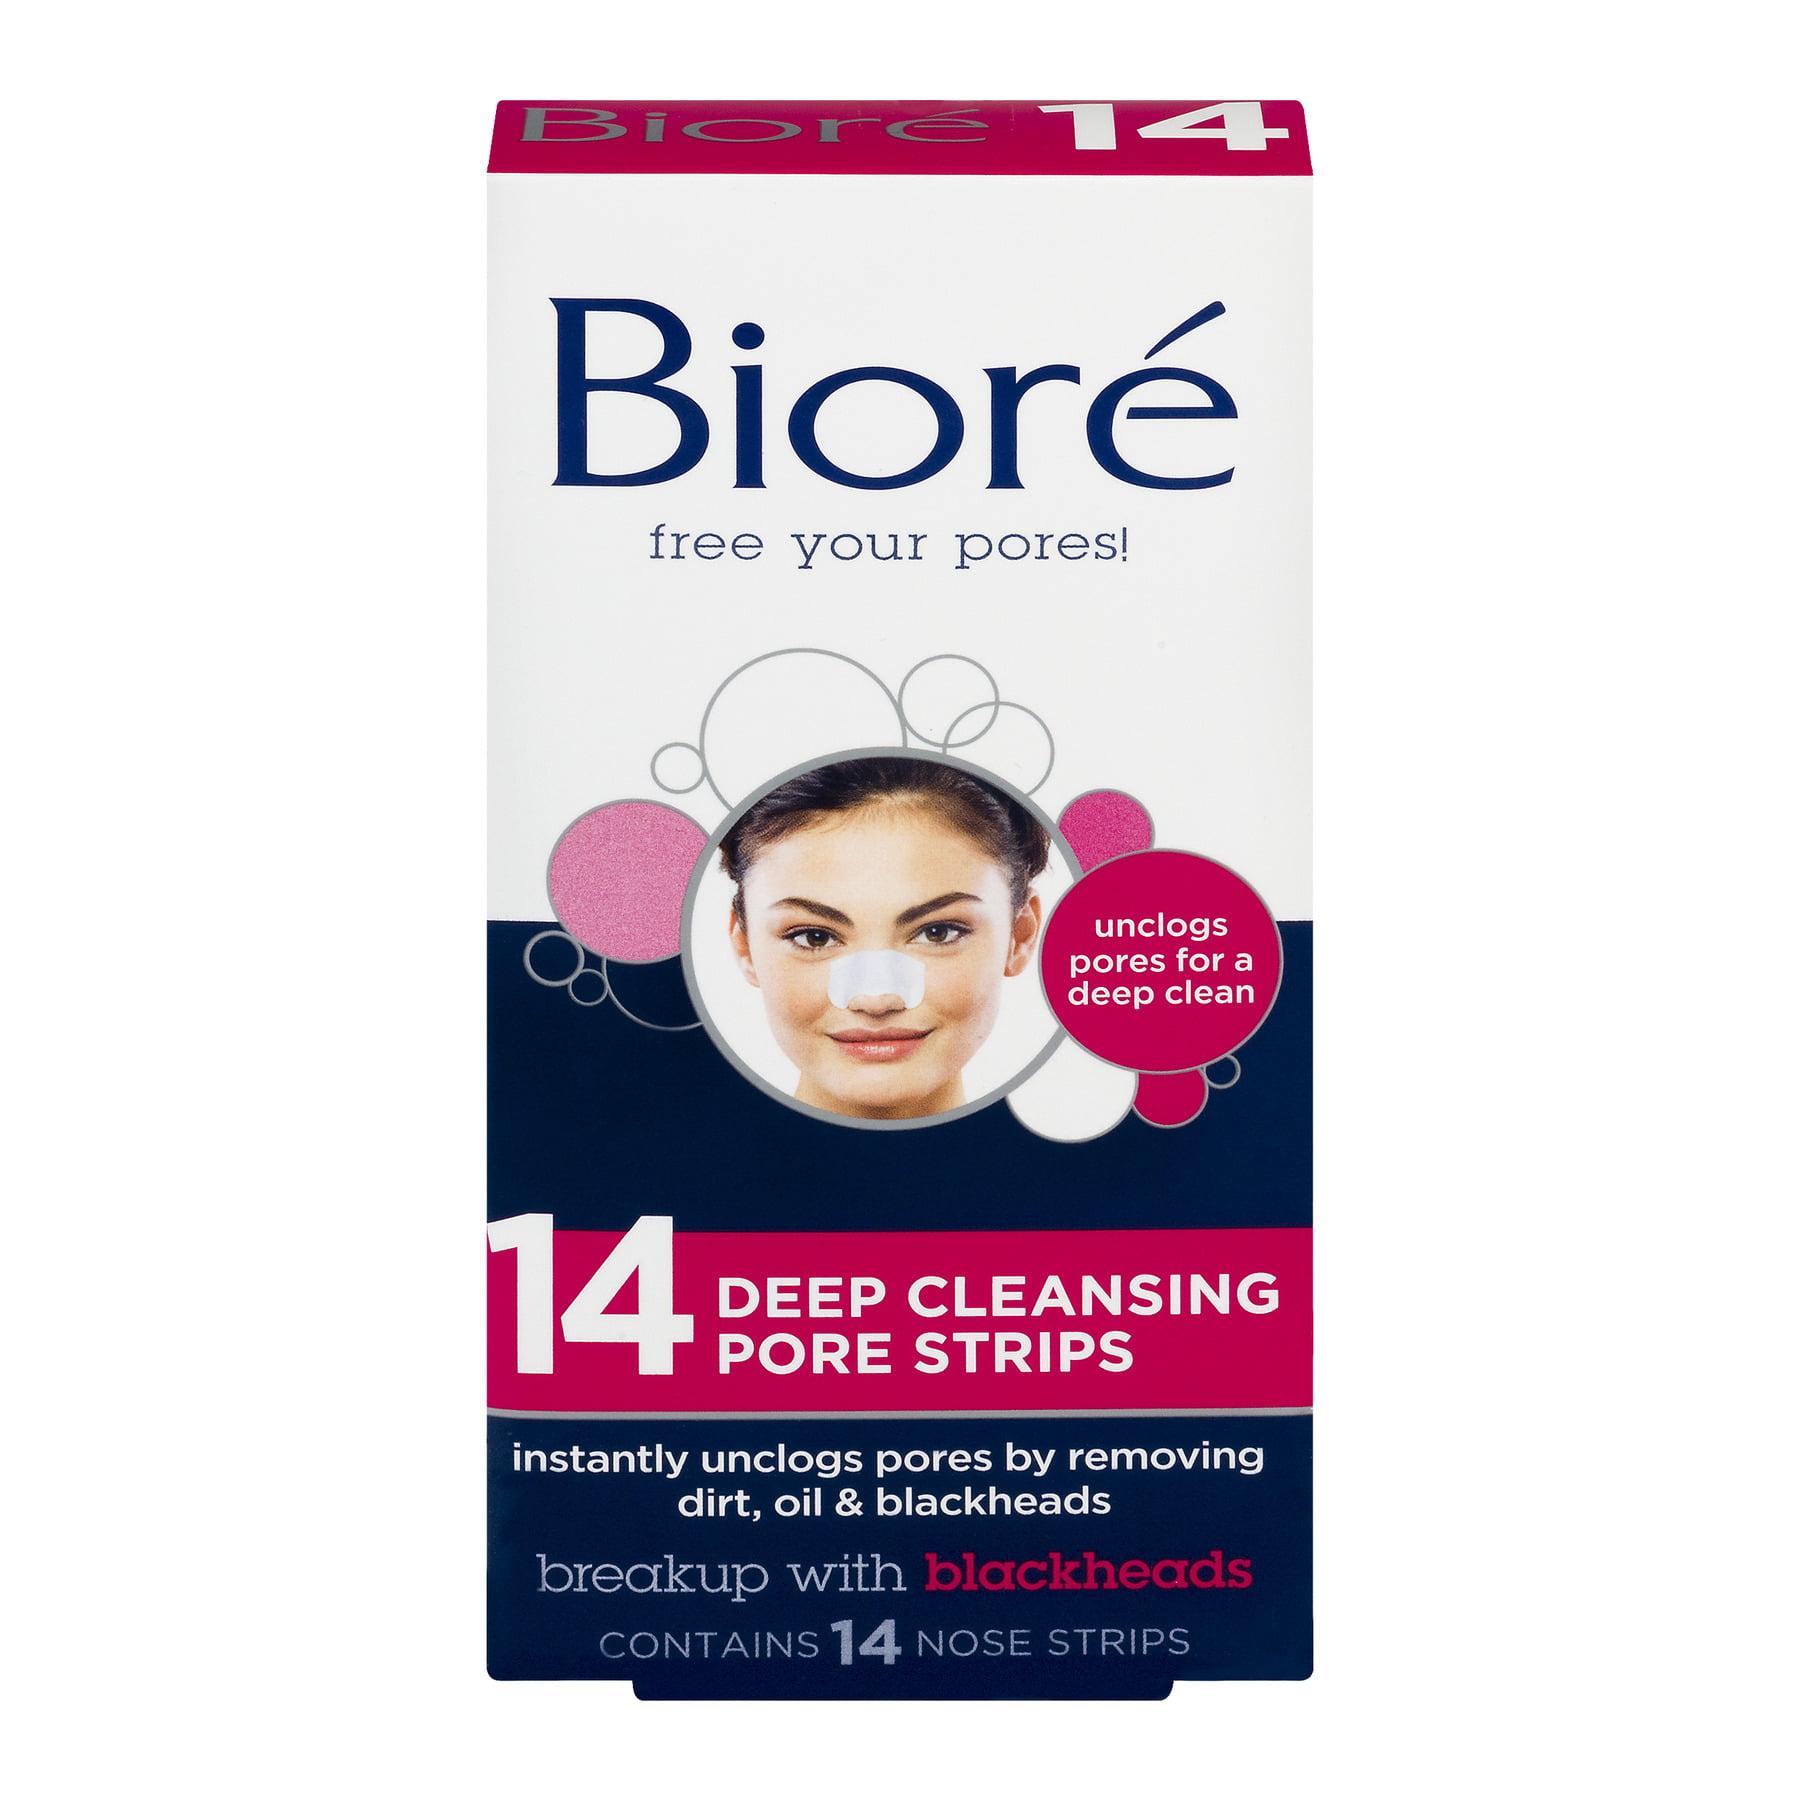 Bioré Deep Cleansing Pore Strips, 14 count